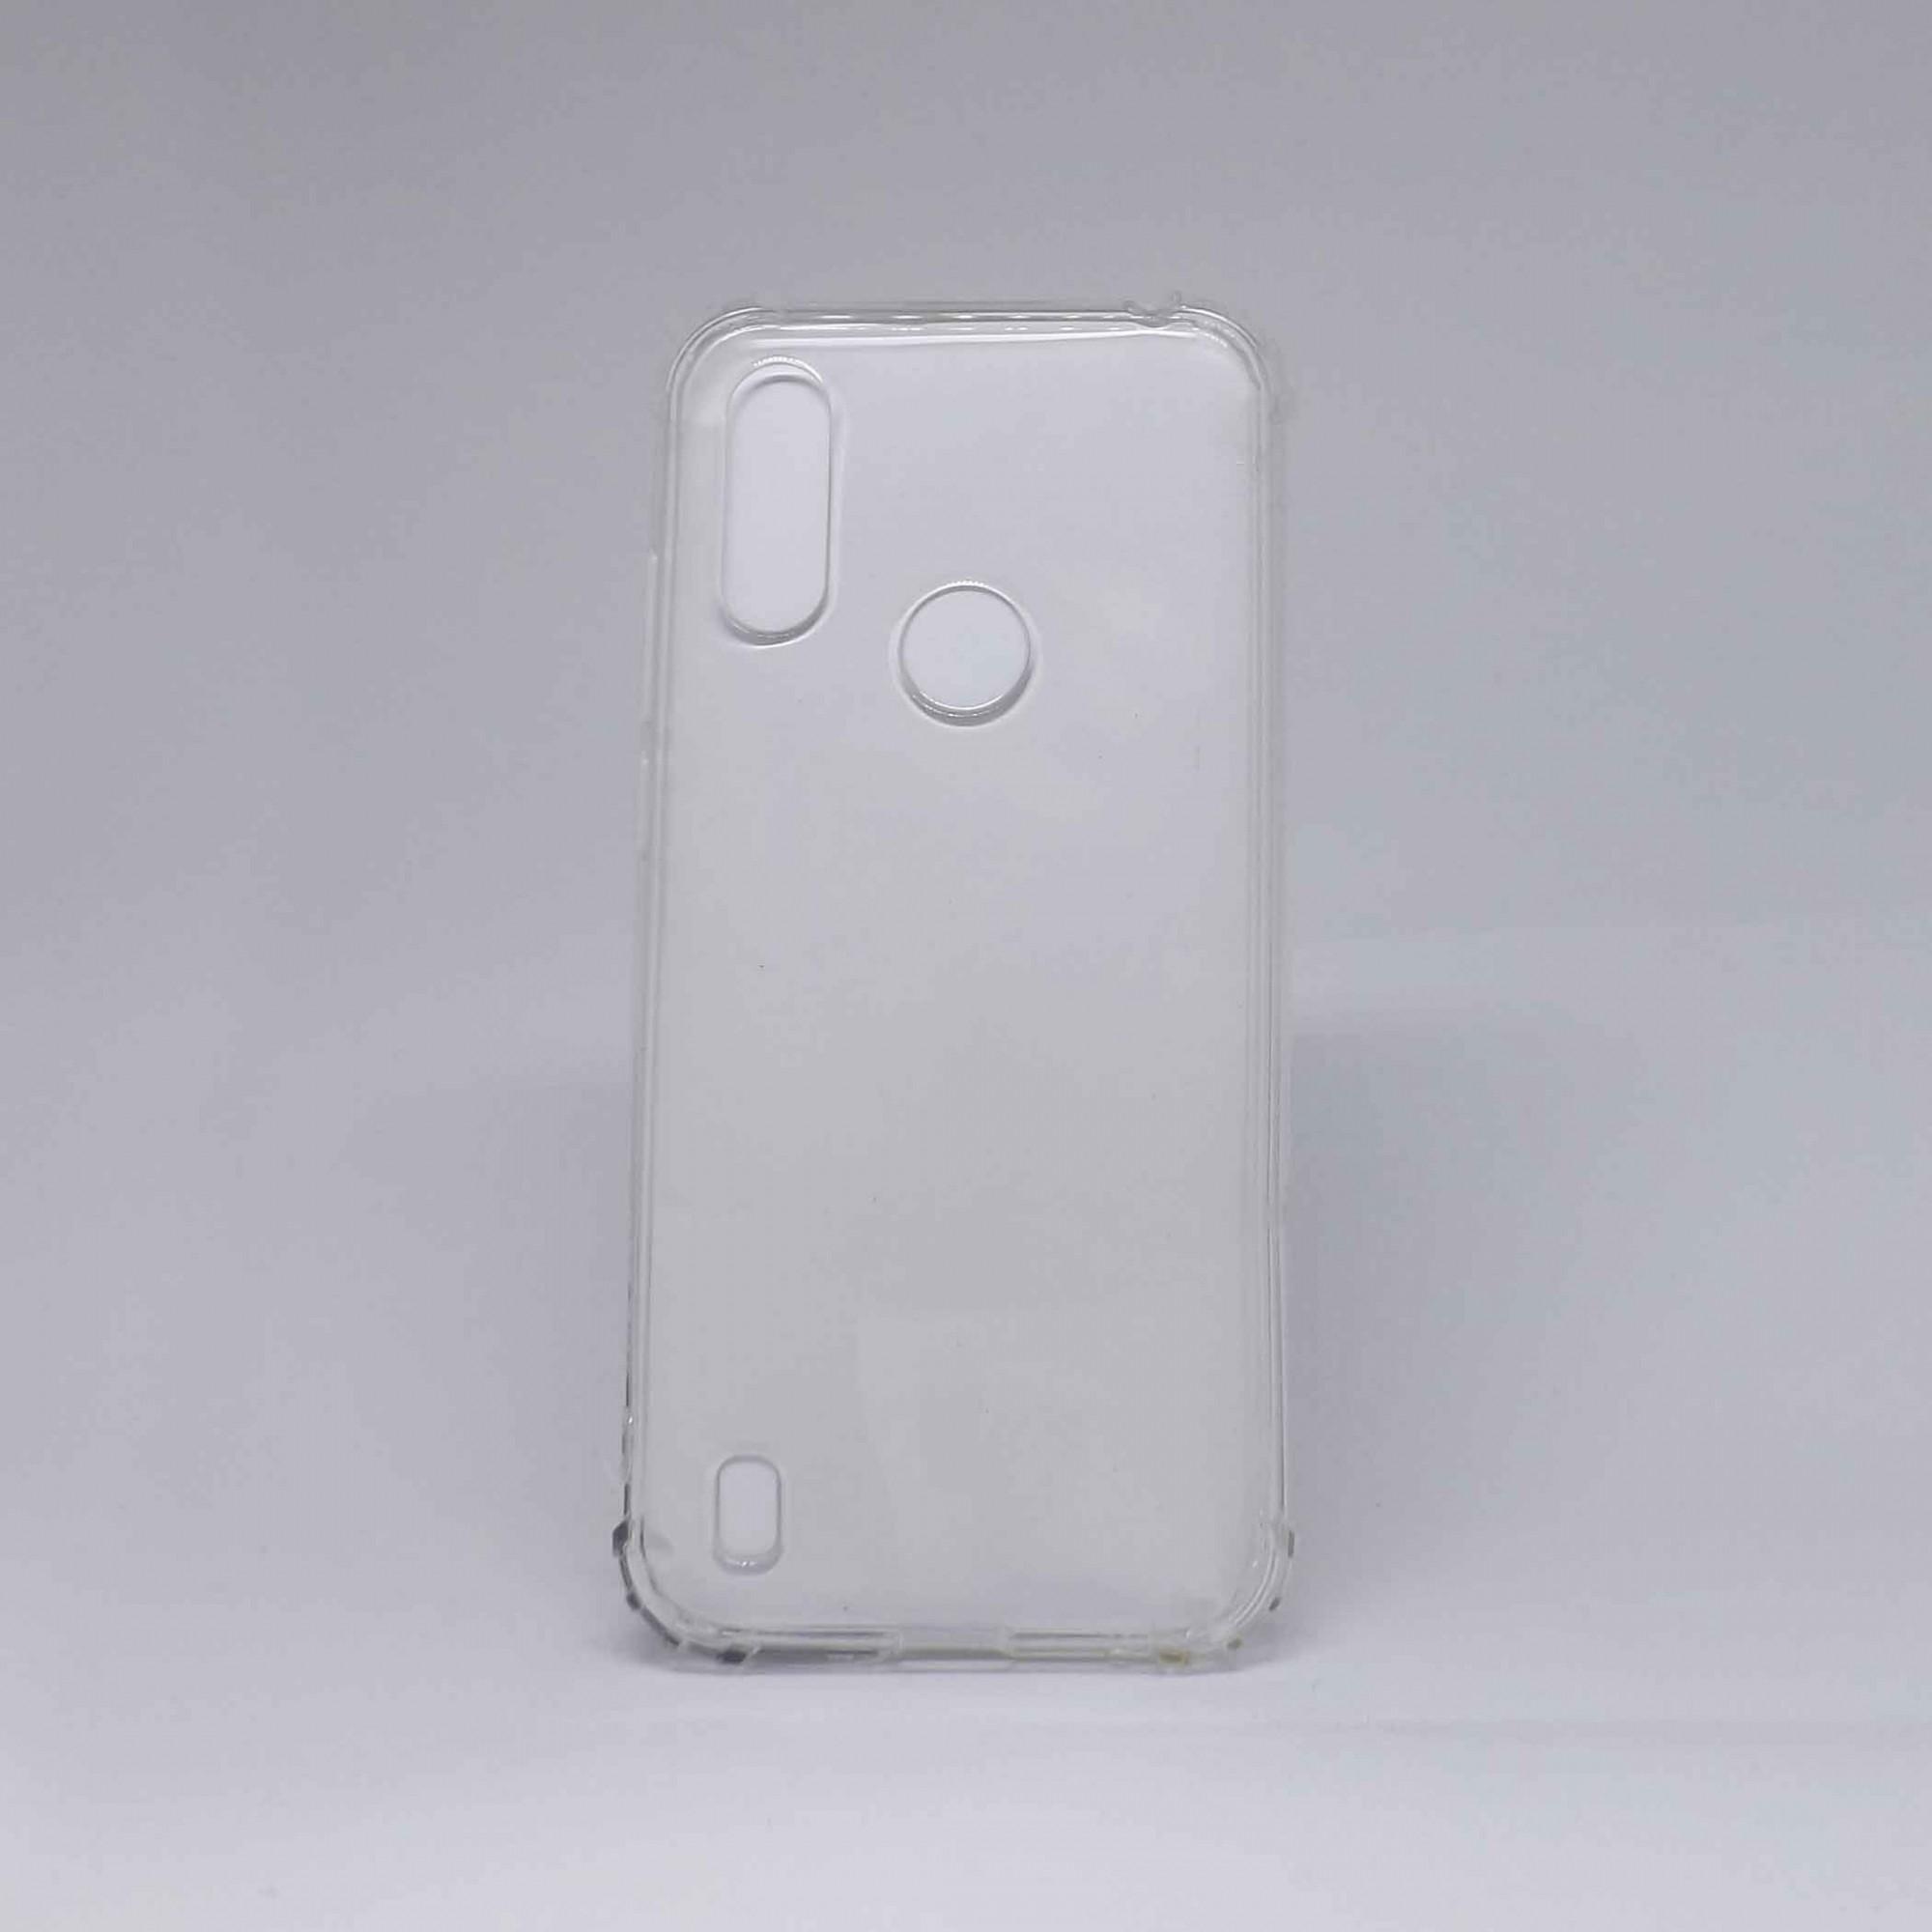 Capa Motorola E6s Antiqueda Transparente